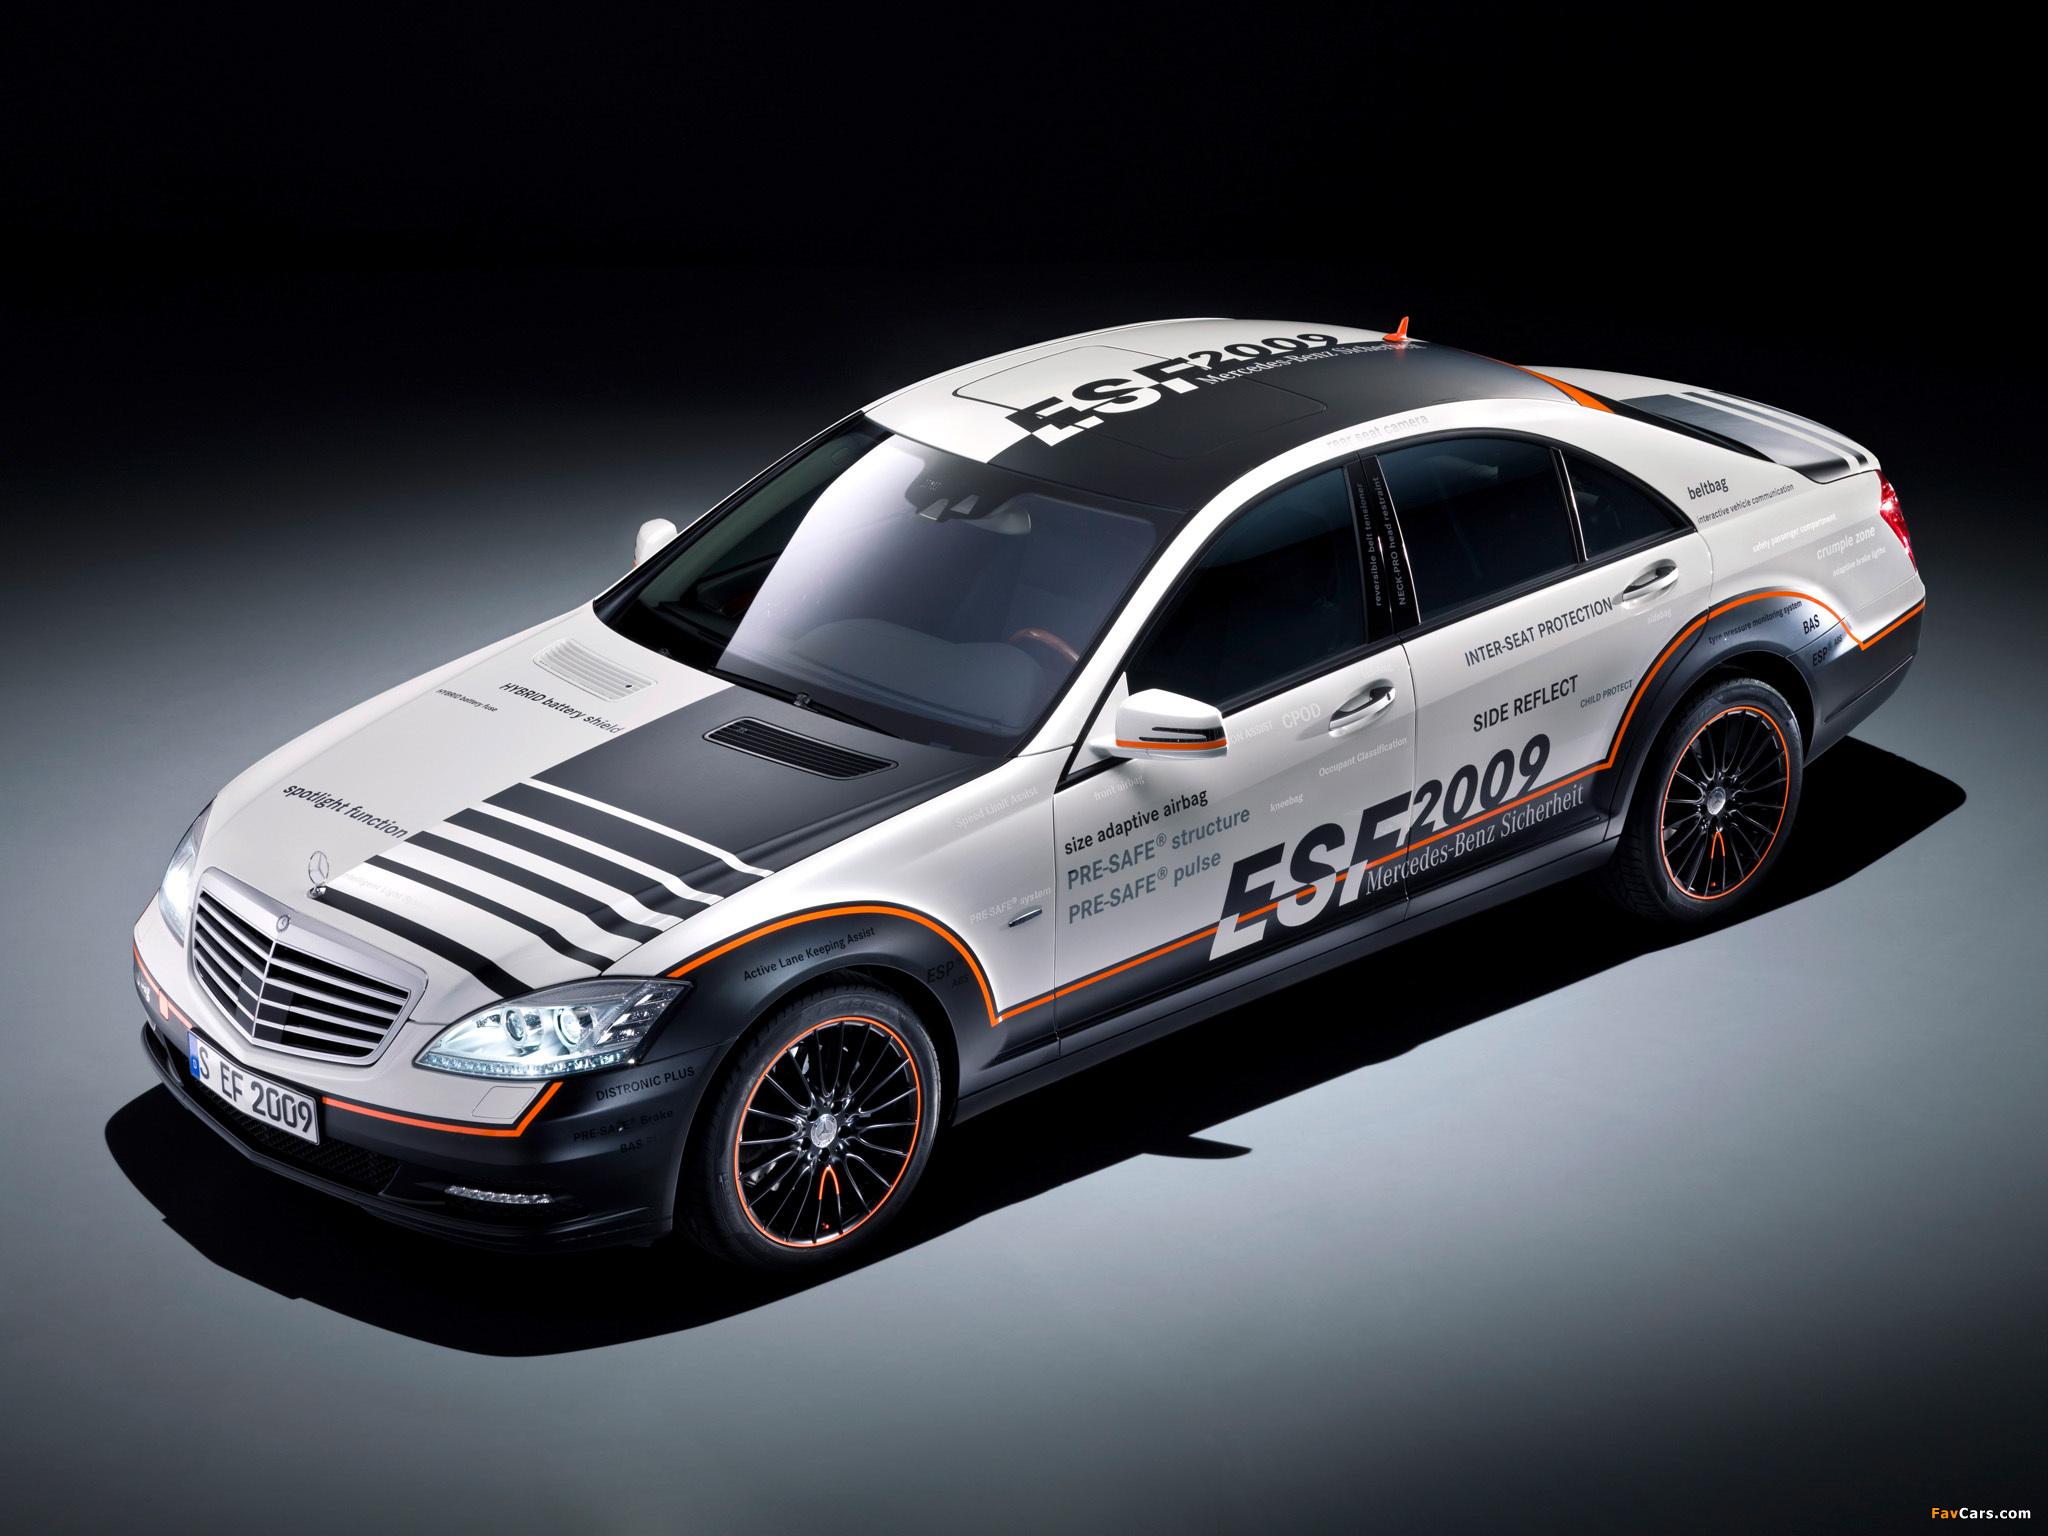 Mercedes-Benz S 400 Hybrid ESF Concept (W221) 2009 images (2048 x 1536)